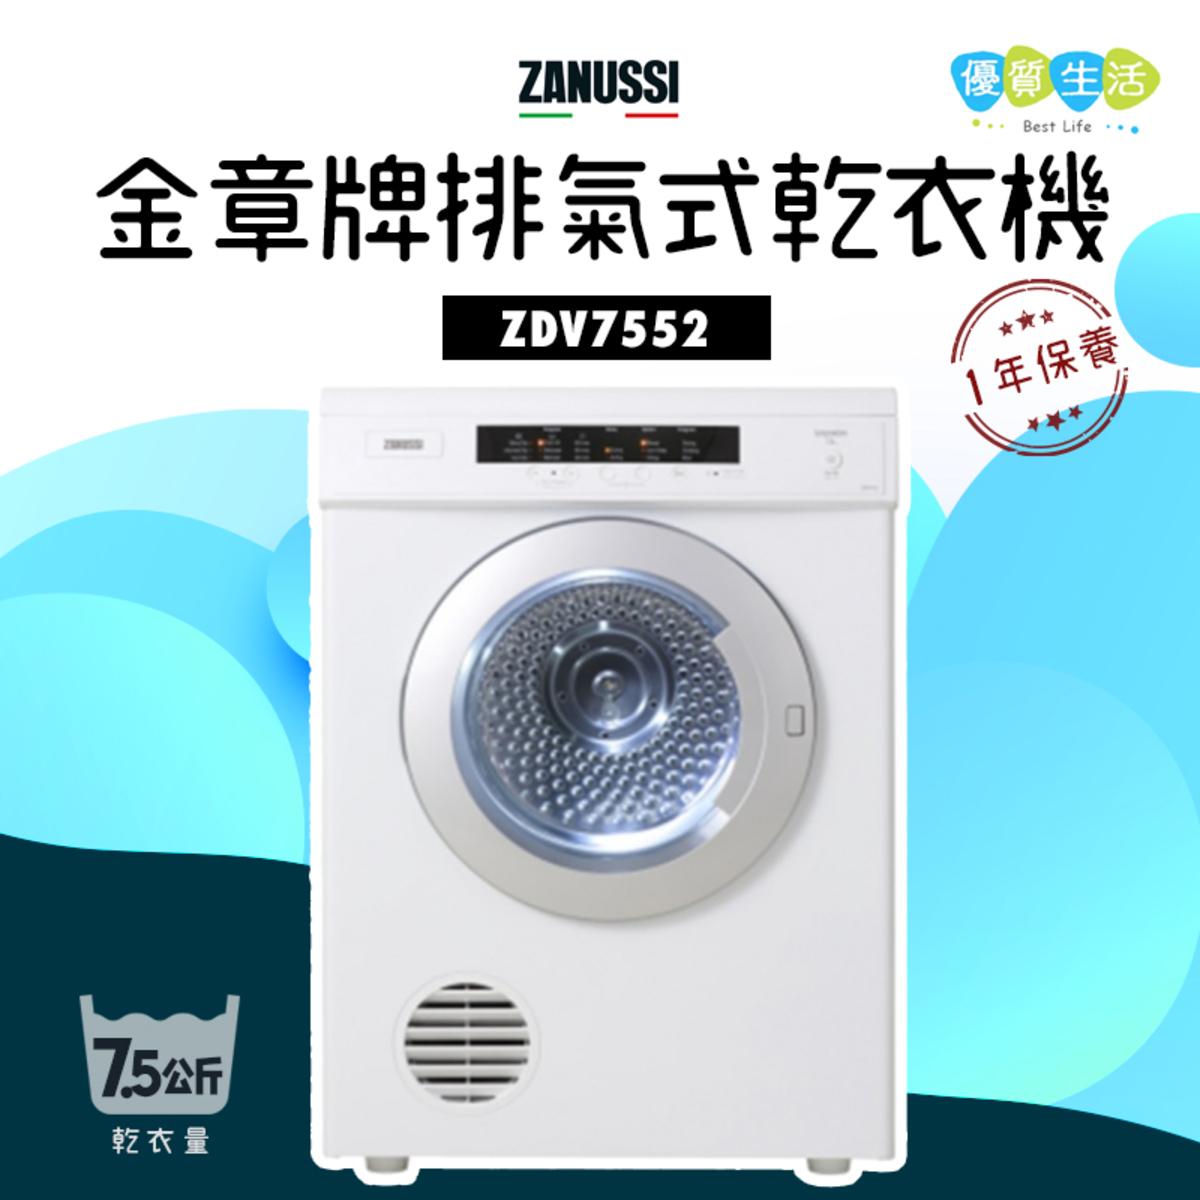 Air- Vented  Dryer 7.5kg  ZDV7552